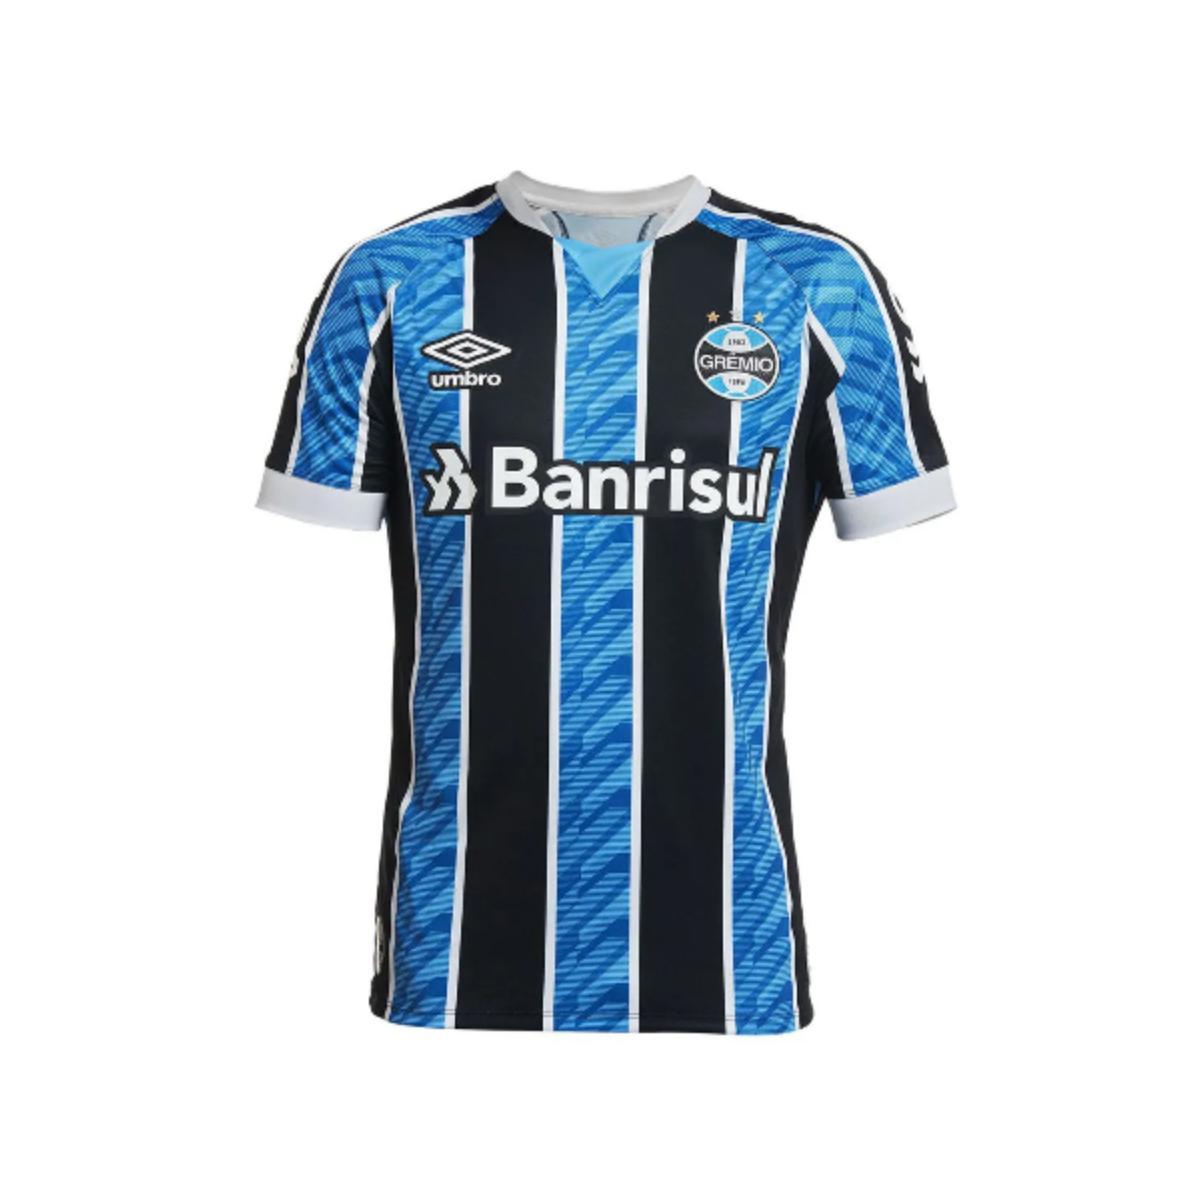 Camiseta Masculina Grêmio 3g161206  Of.1 2020 Classic C/n 11 Tricolor